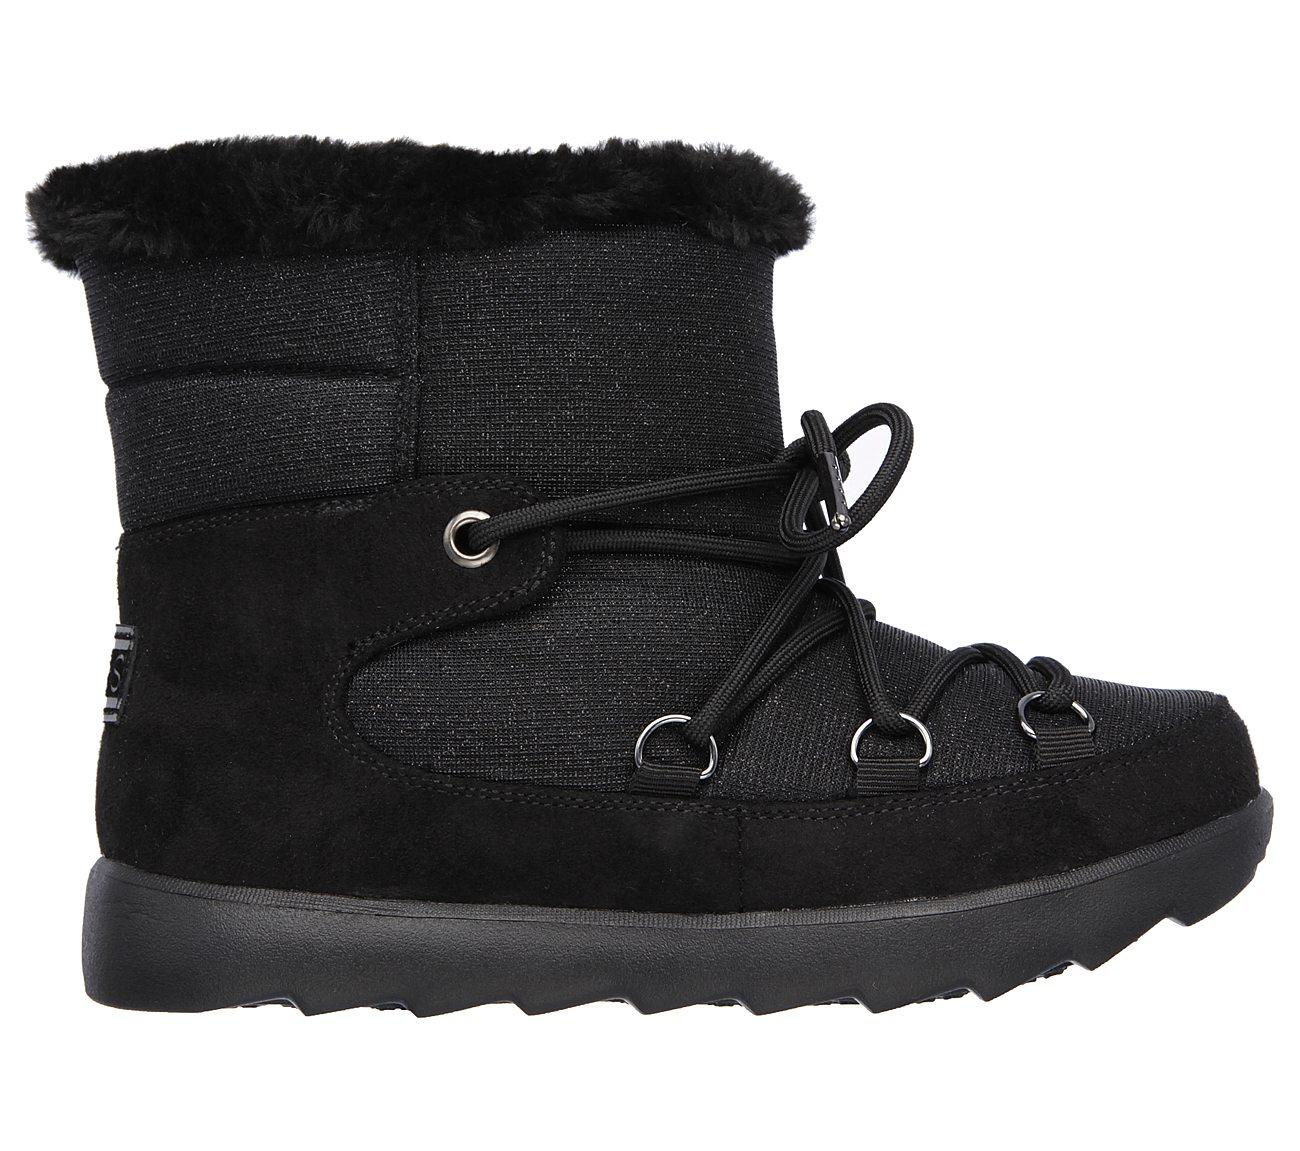 Buy SKECHERS BOBS Mementos - Snowcap BOBS Shoes only  38.00 4a2eb331fb3